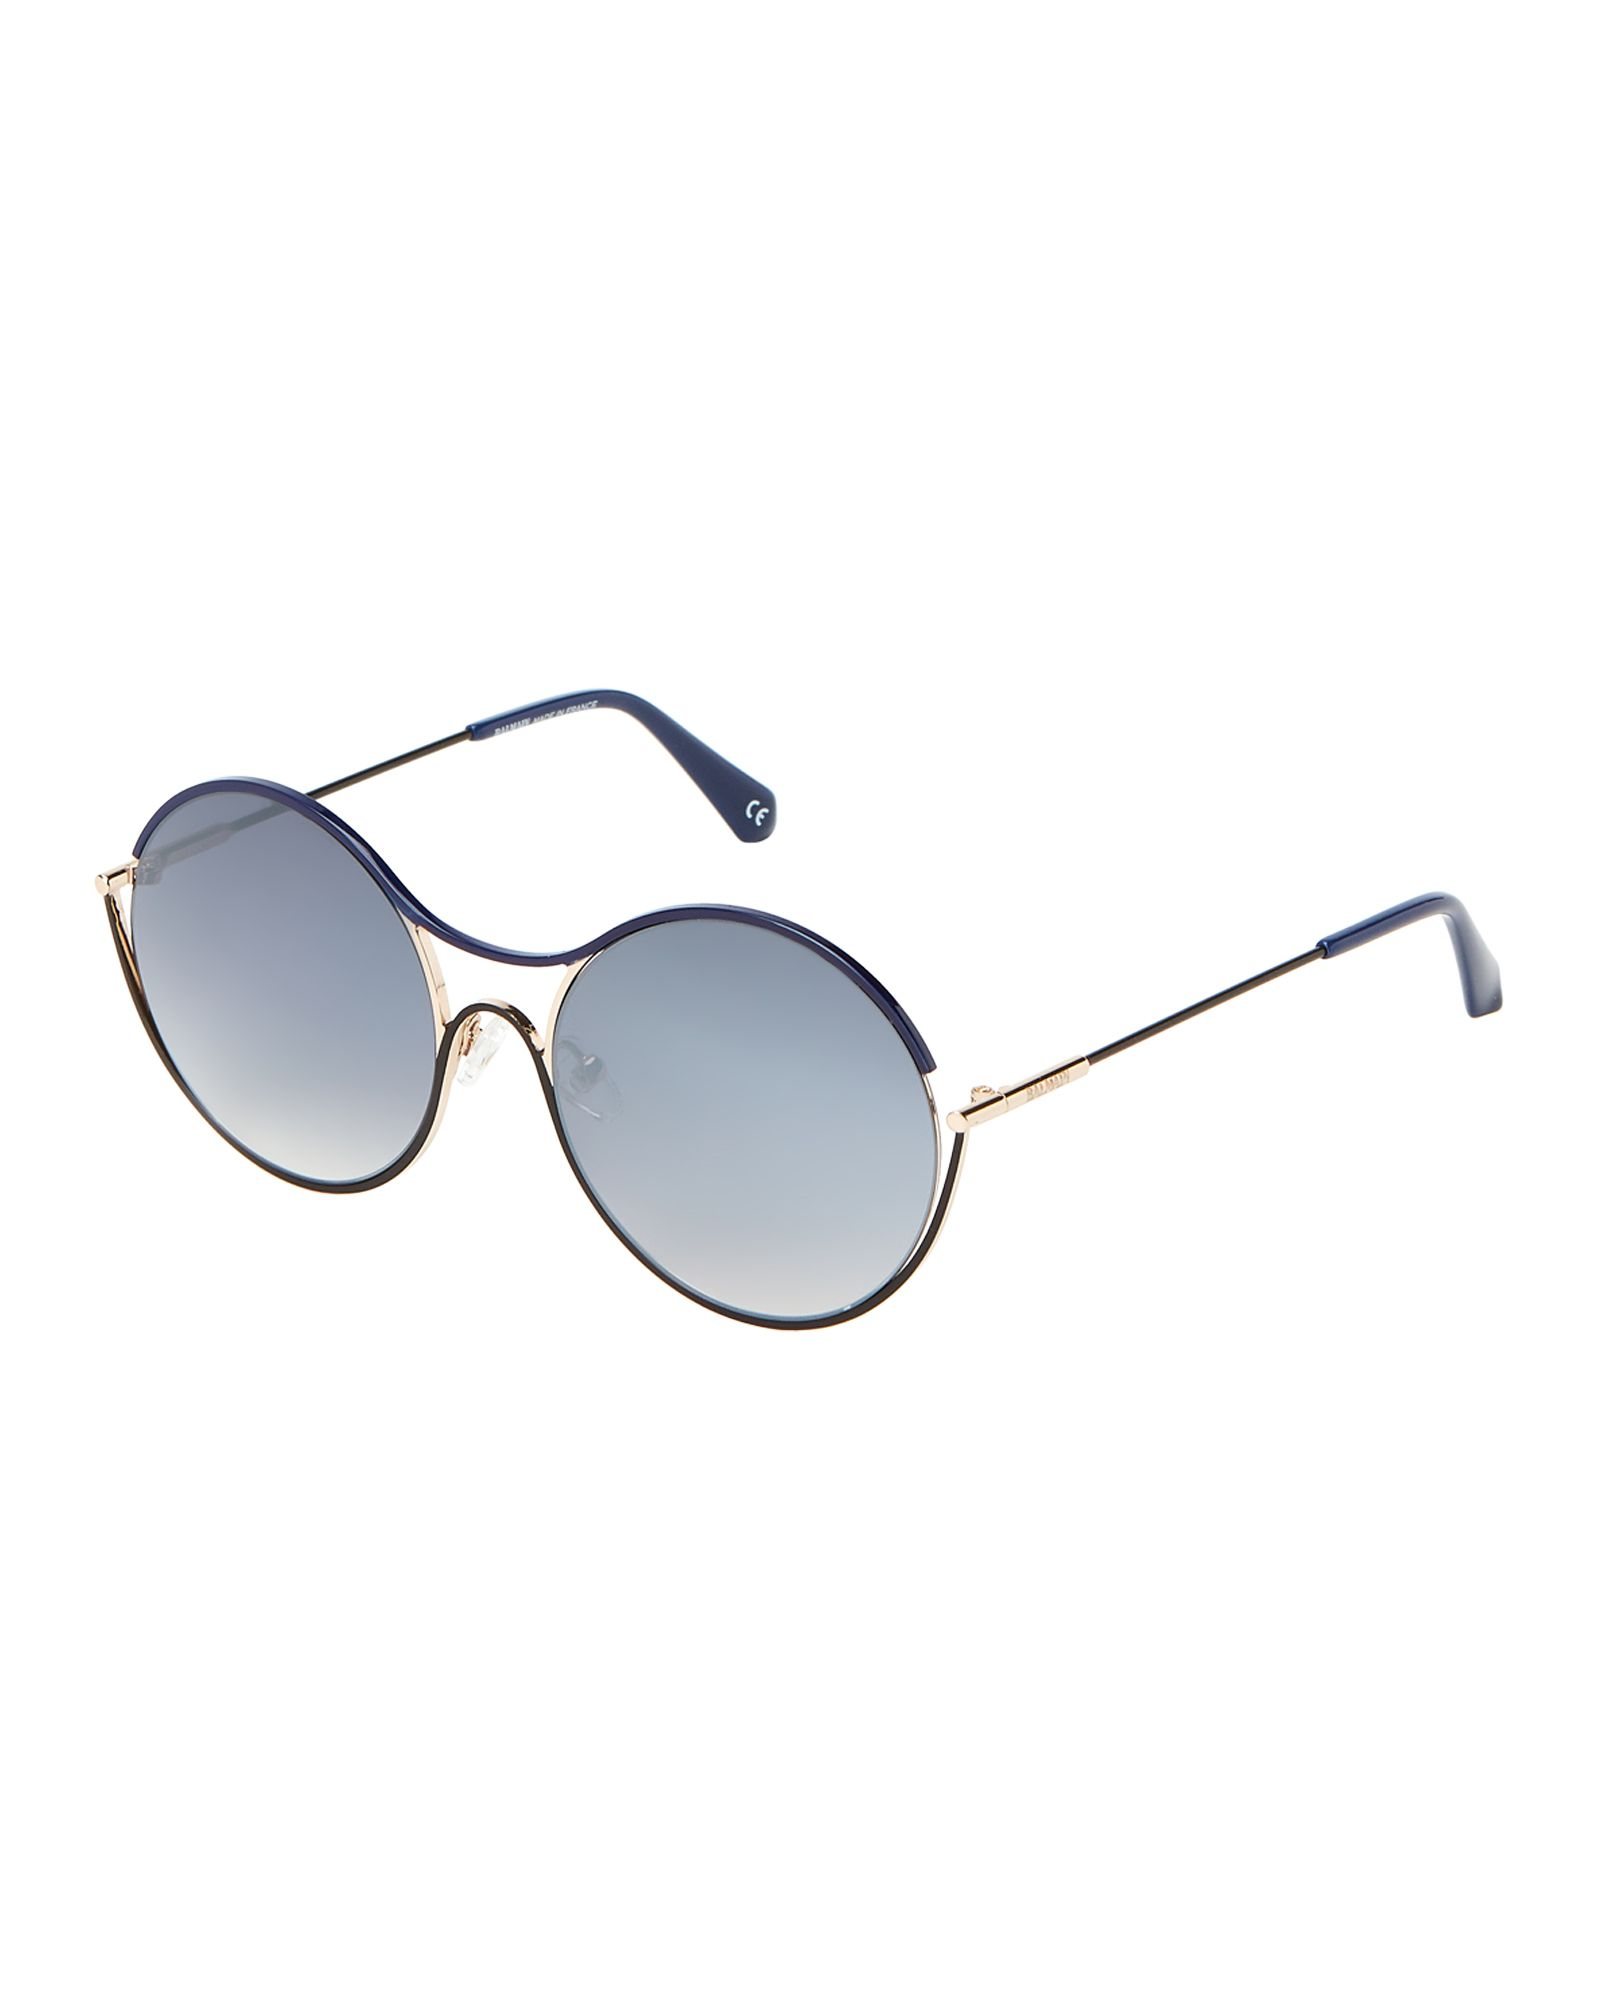 62622827f LaBorsaElite.com has Balmain Sunglasses on sale up to 80% off on some items